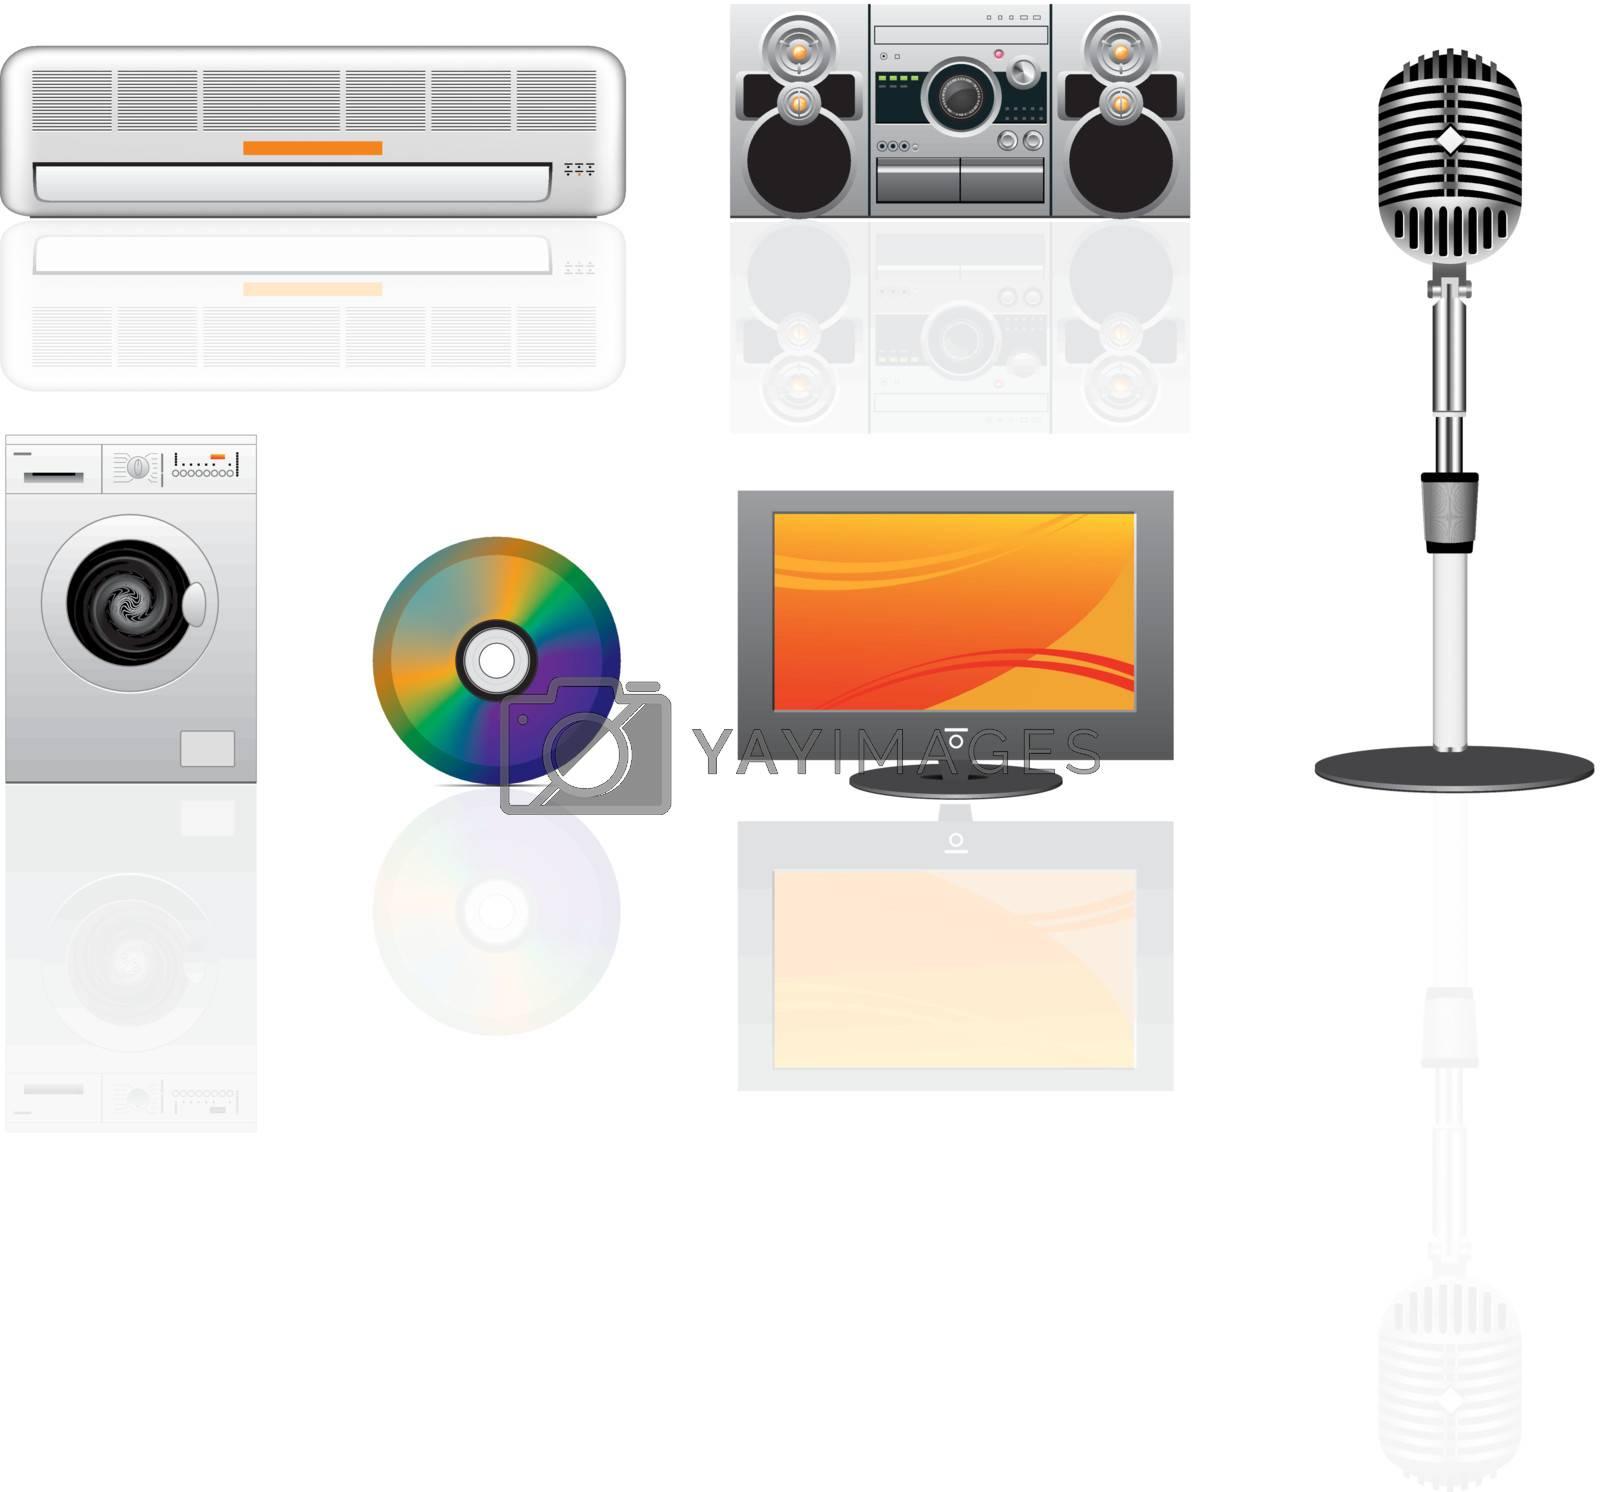 appliance svector icons set